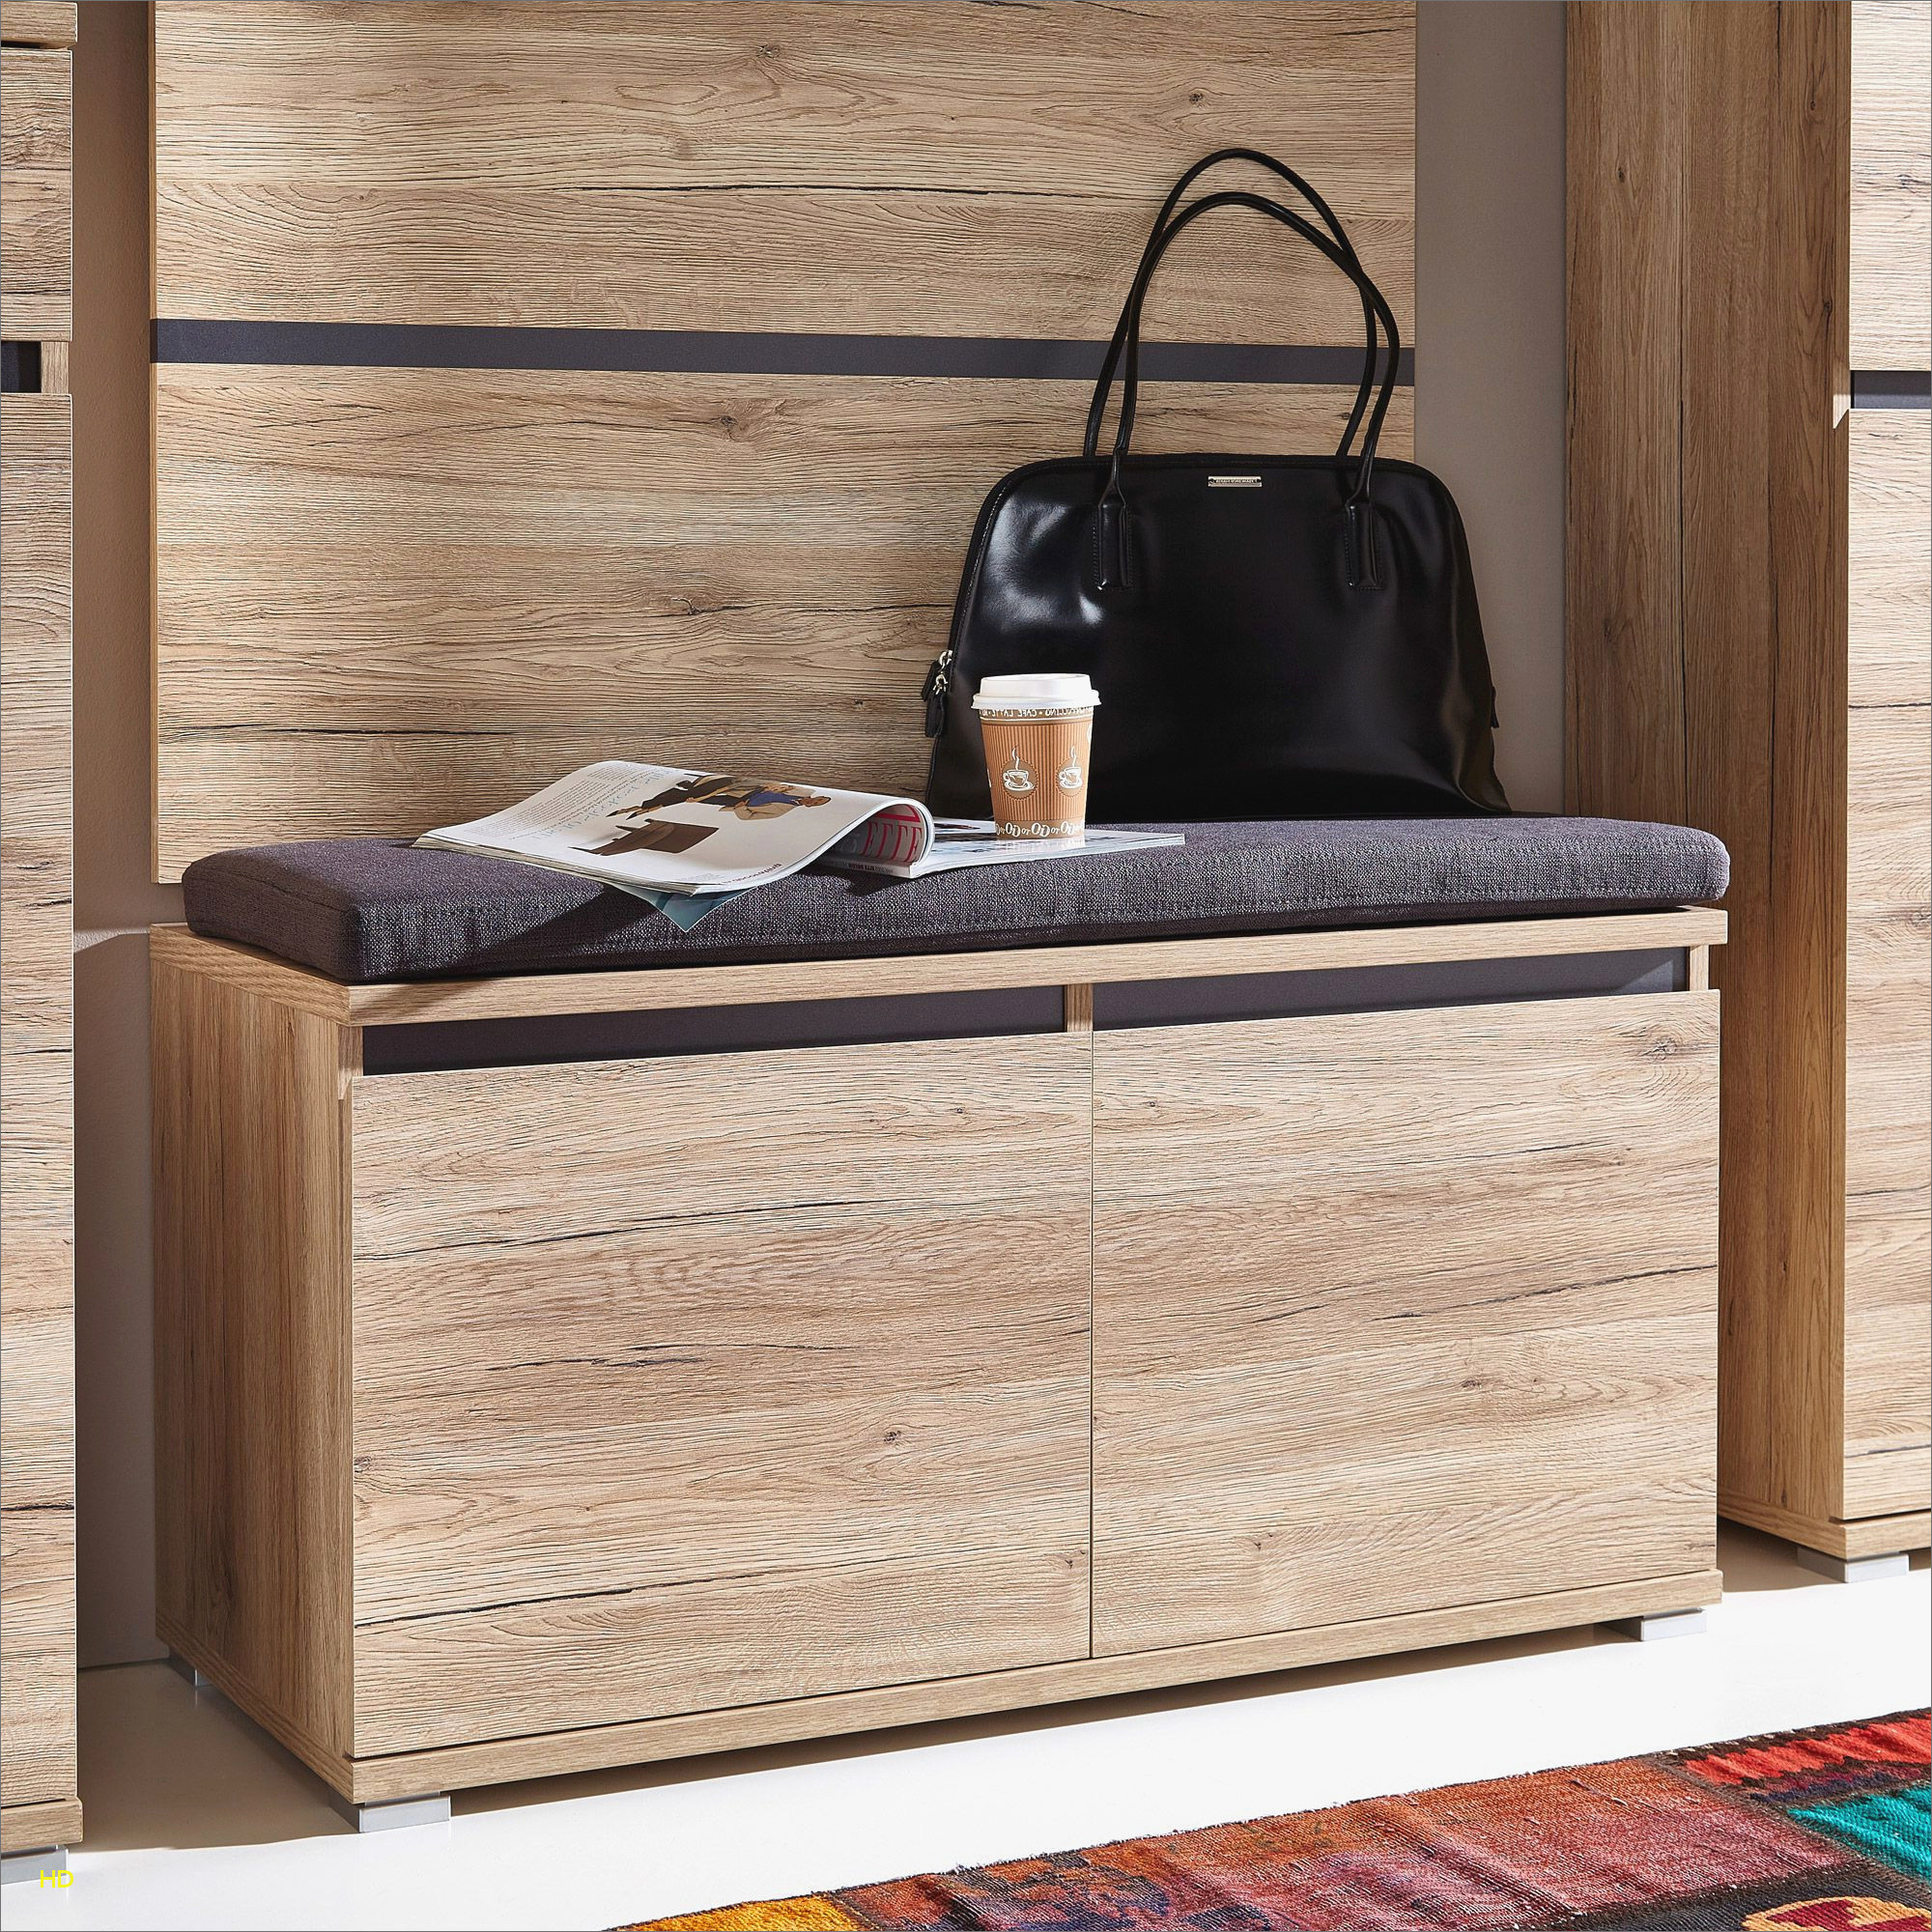 fabricant meuble bois massif meuble banc beau meuble de cuisine bois massif banc salon elegant of fabricant meuble bois massif